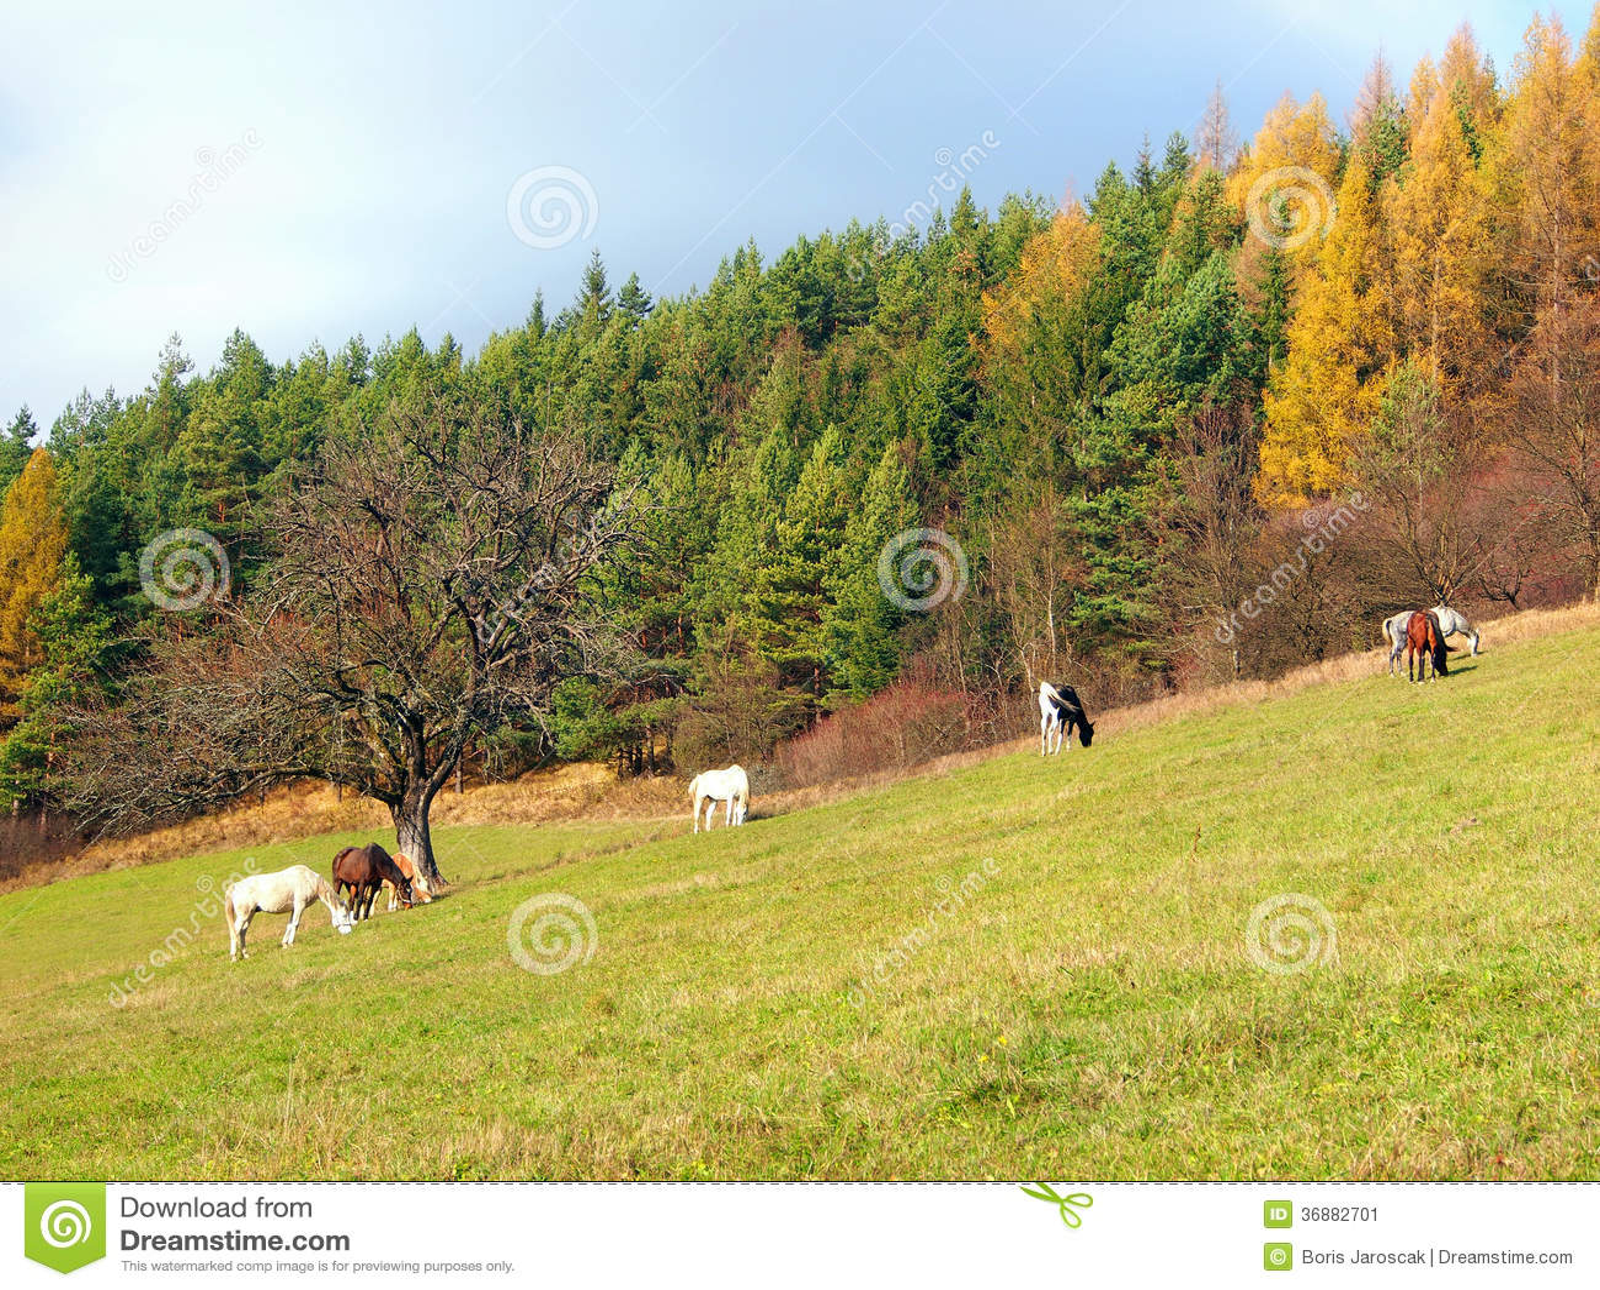 Horses grazing in autumn field